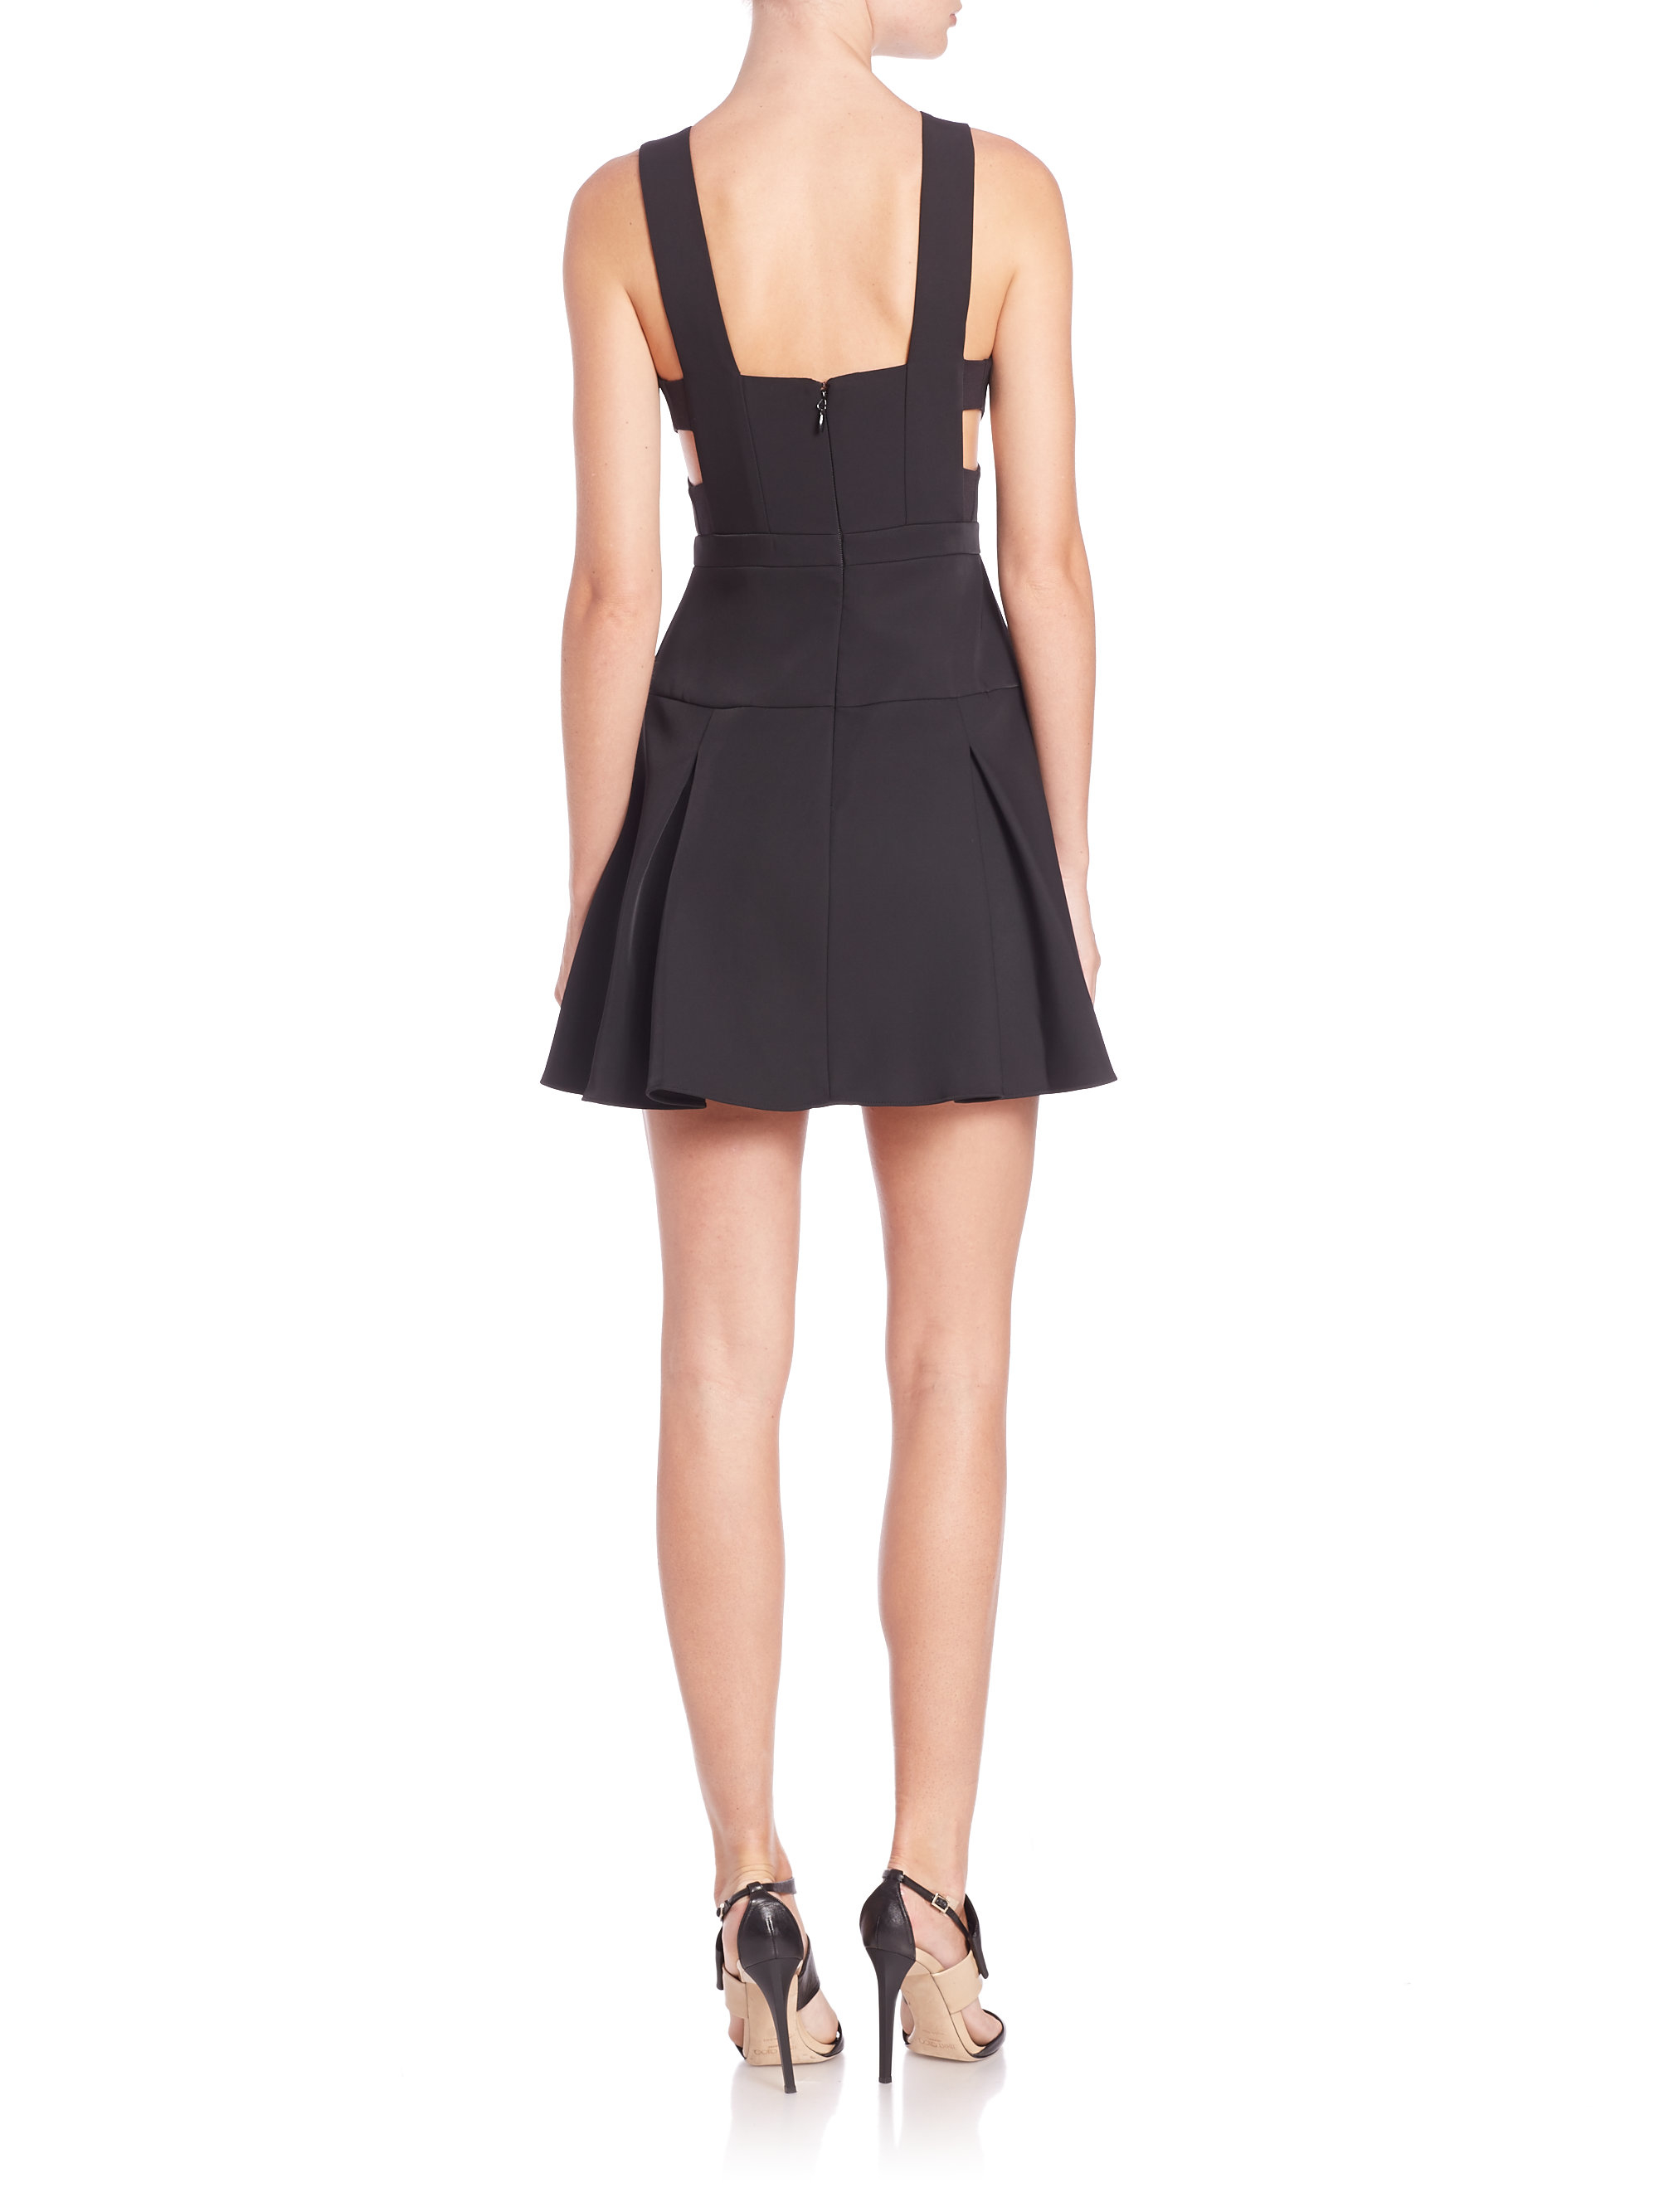 BCBG Long Black Dress with Cut Out Back – fashion dresses